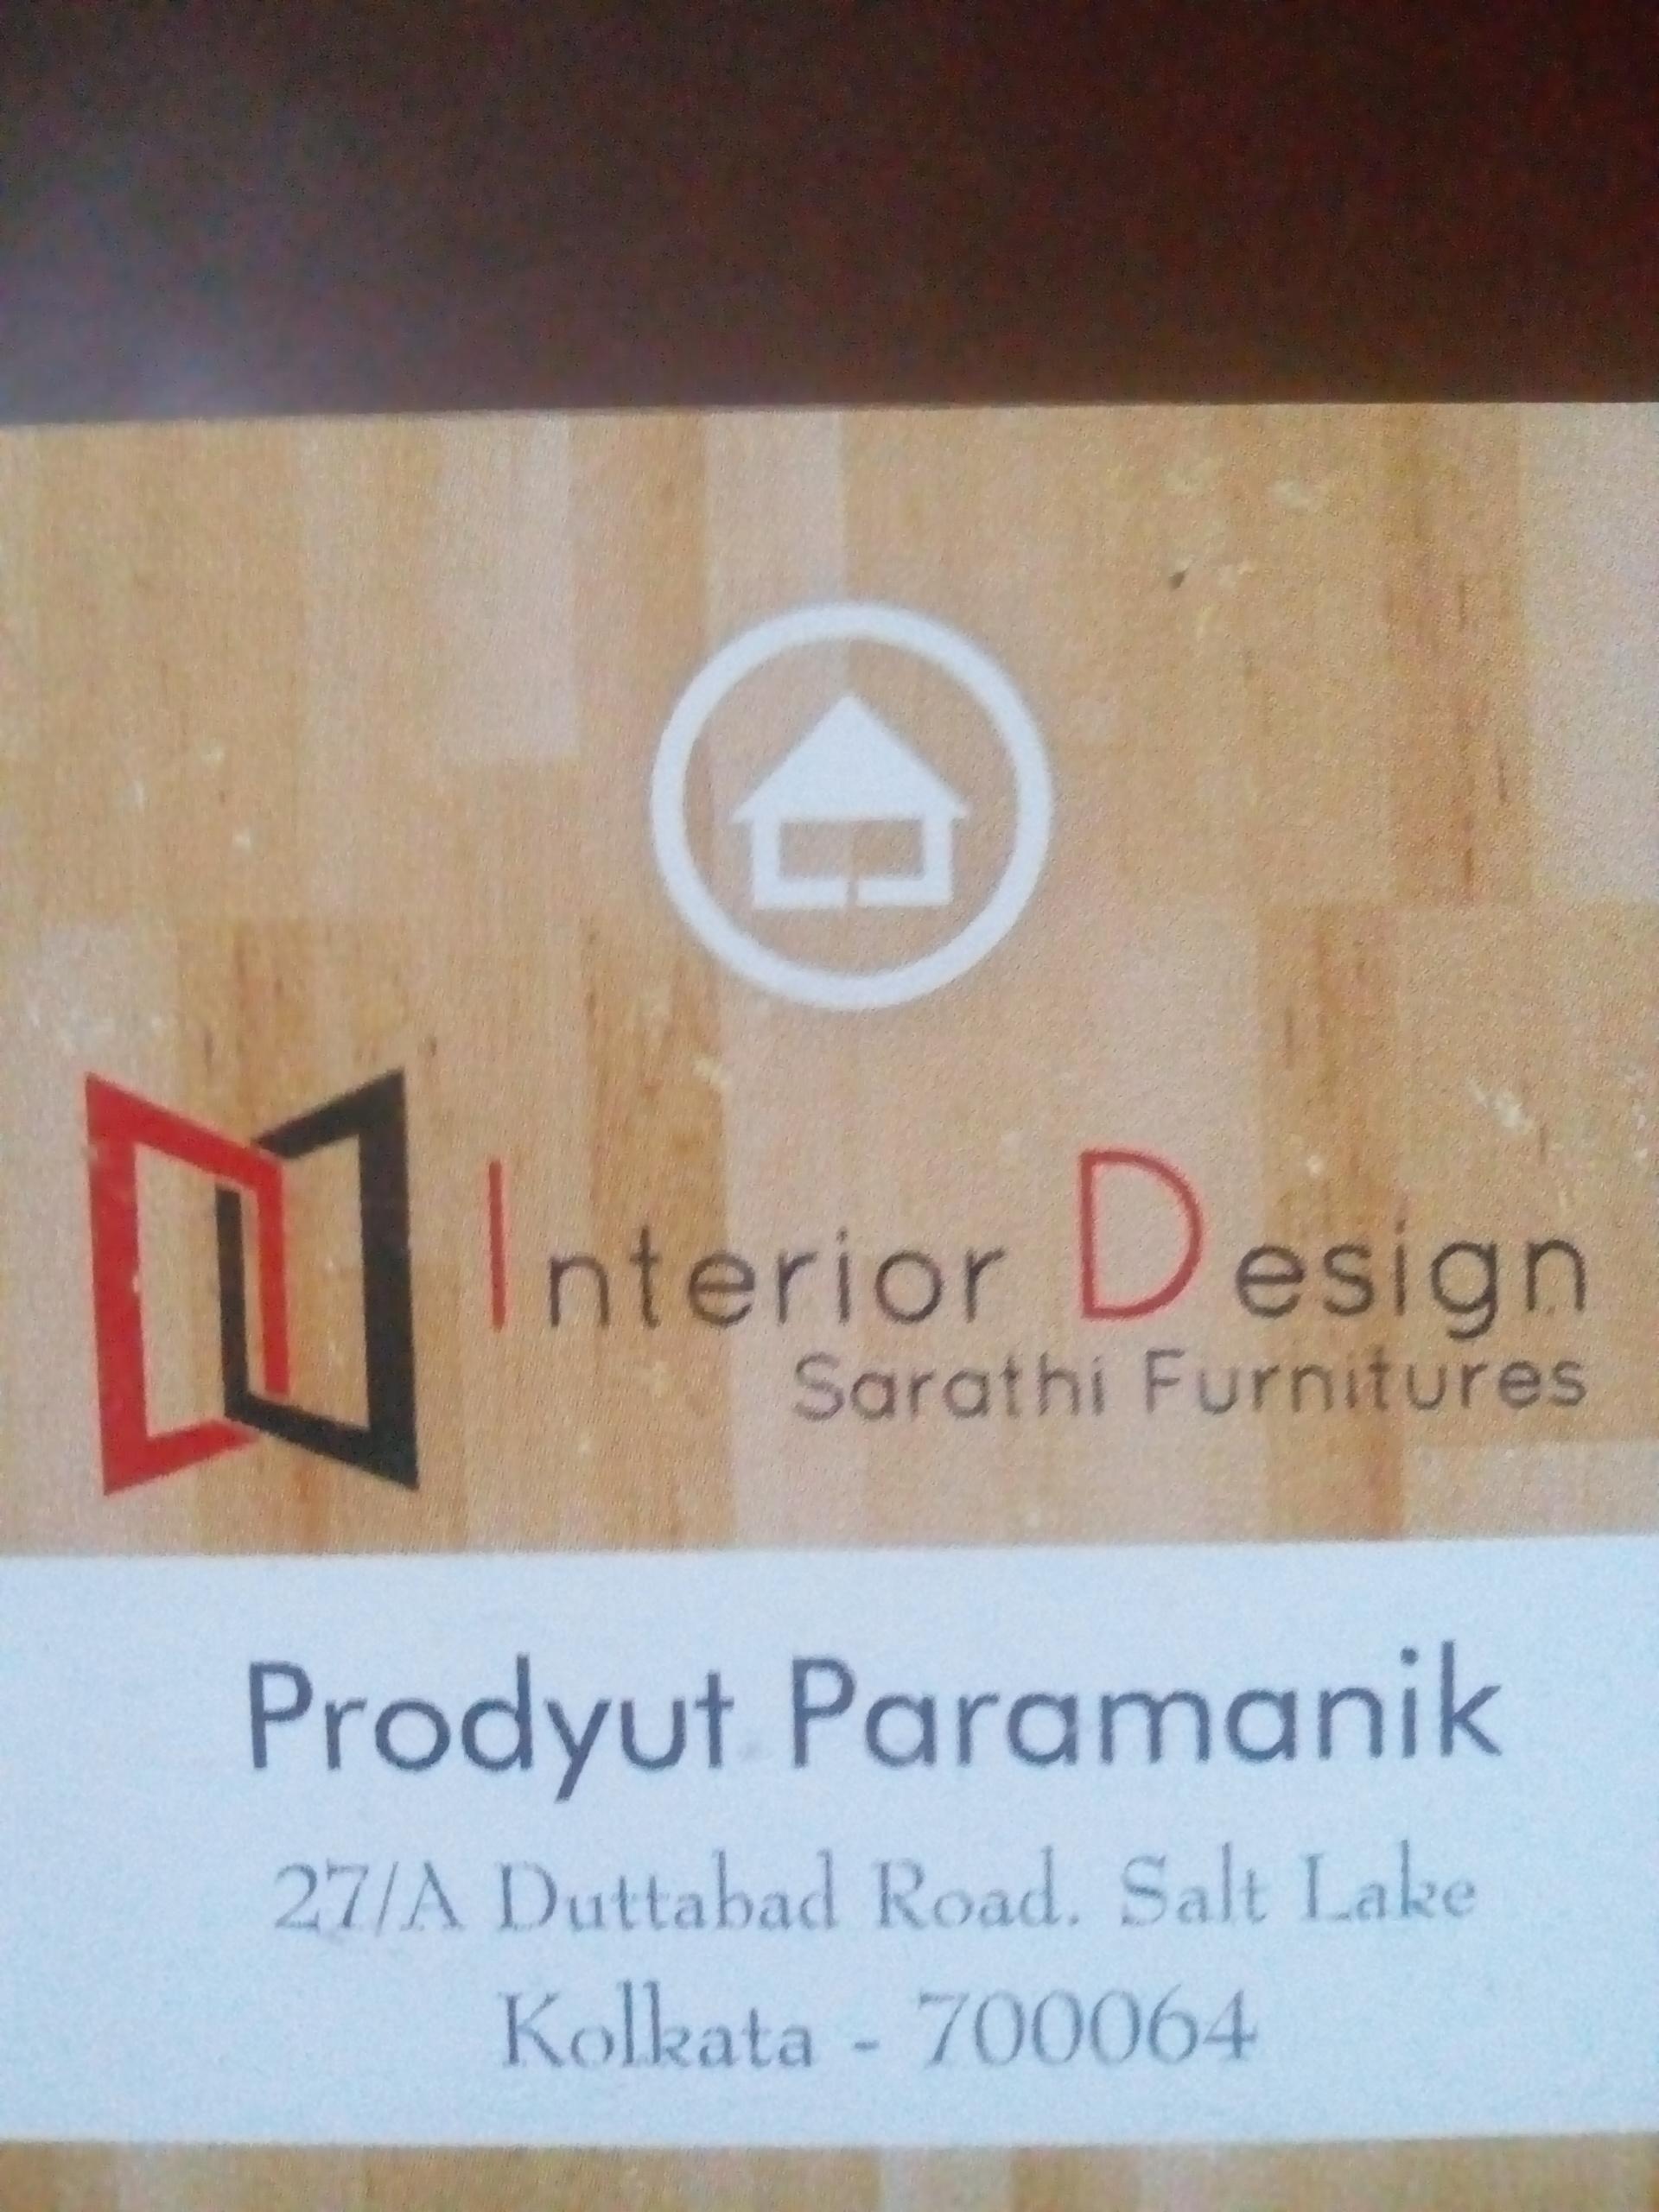 Salt lake city interior designers - Interior Design Sarathi Furnitures Salt Lake City Kolkata Compare